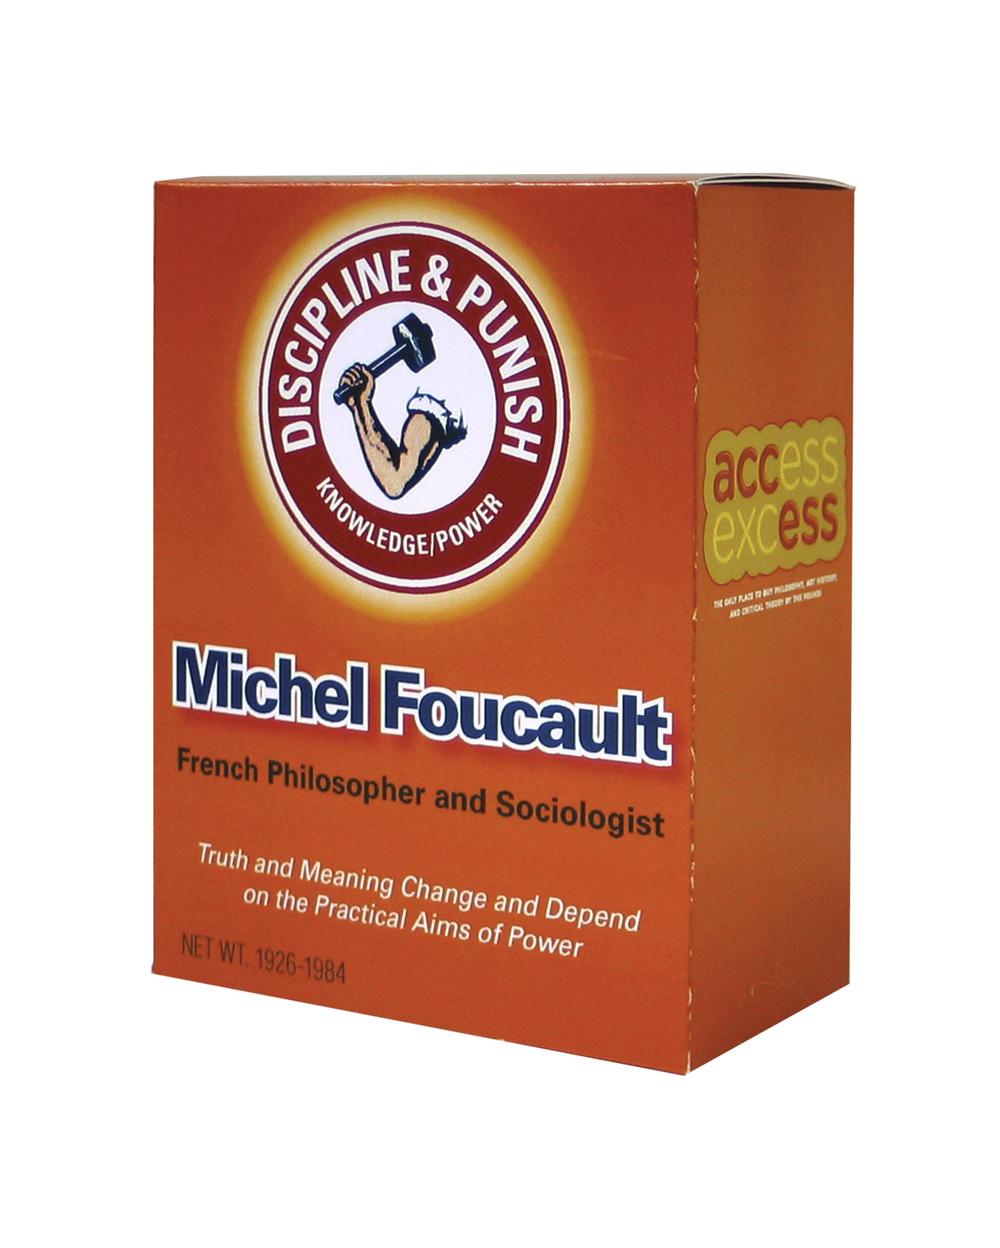 Foucault_package.jpg